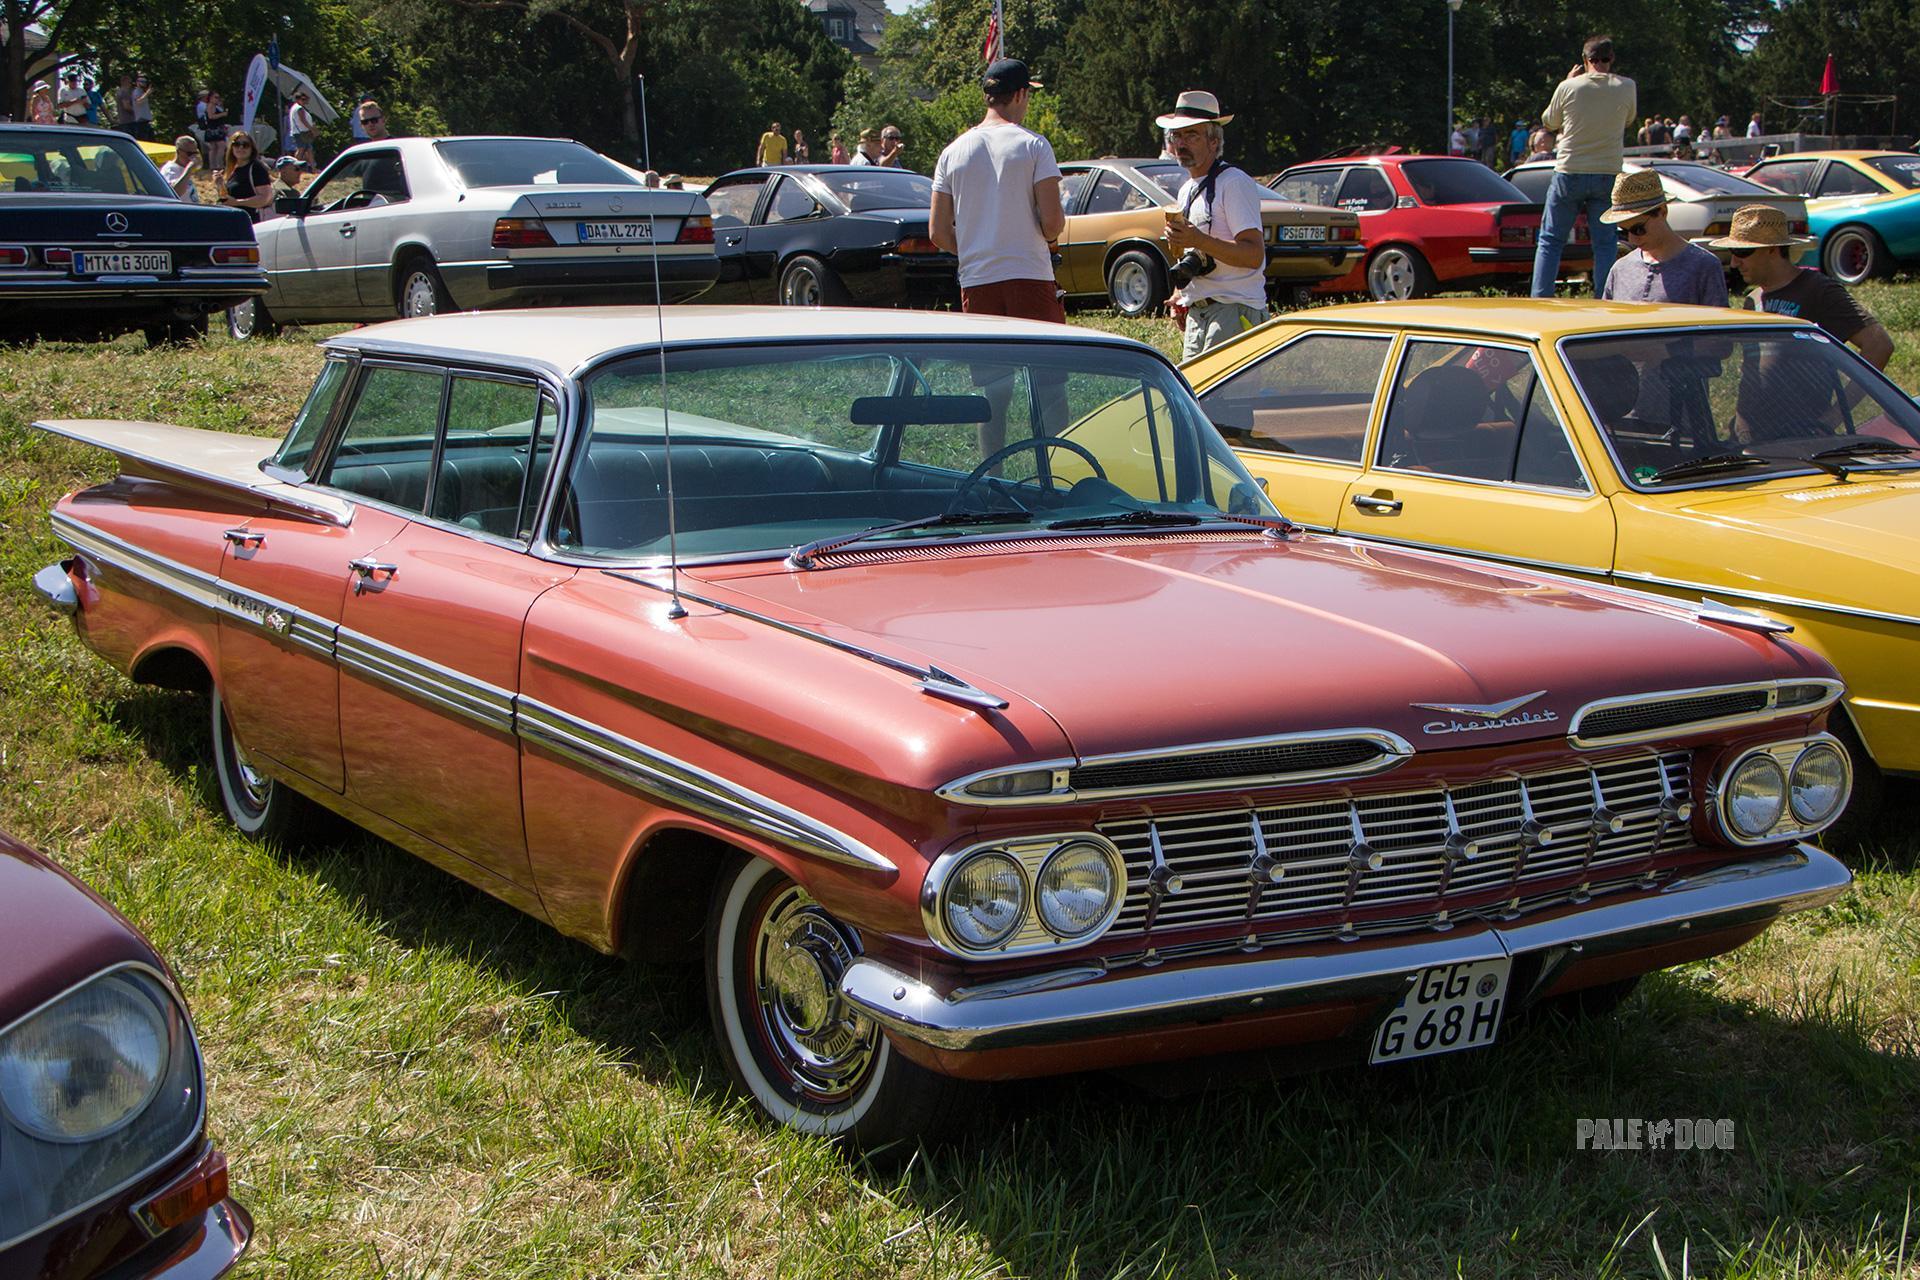 1959 Chevrolet Impala Hardtop Sport Sedan Front View Post War Paledog Photo Collection